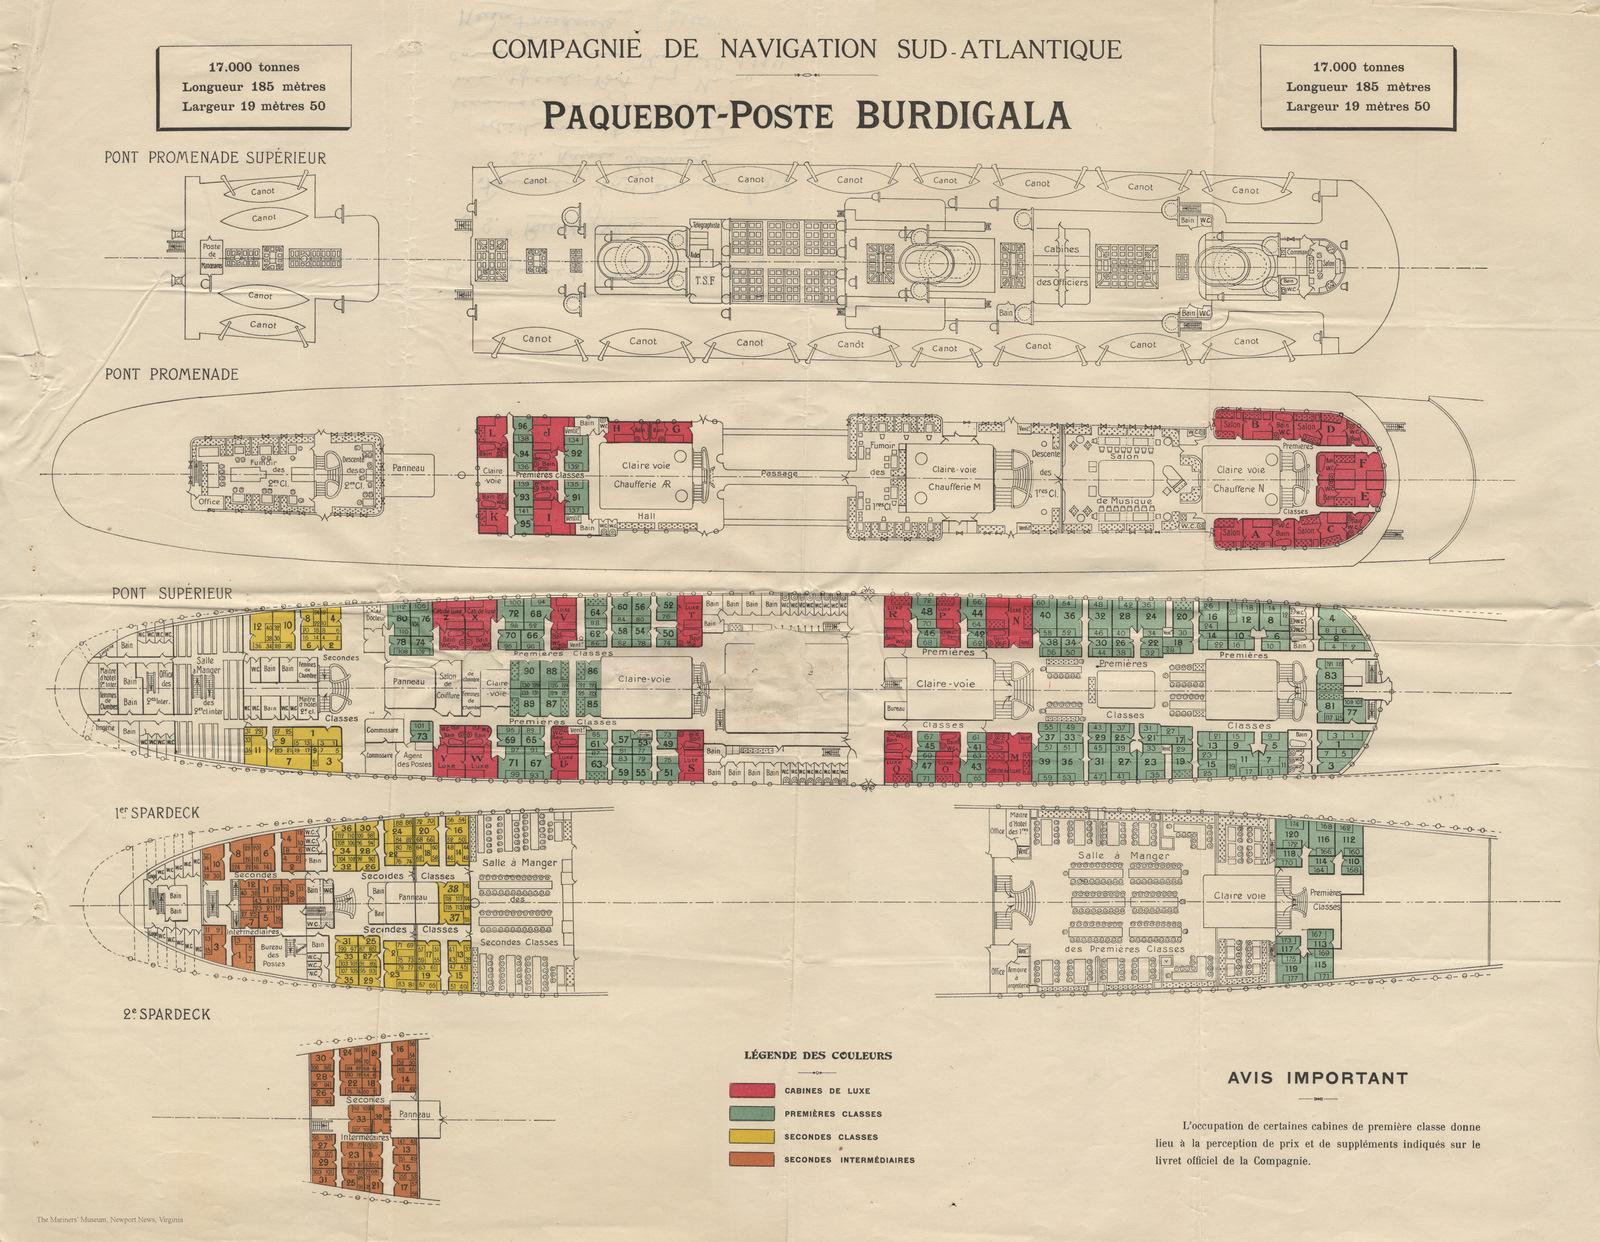 S/S Burdigala - Accomodation Plans